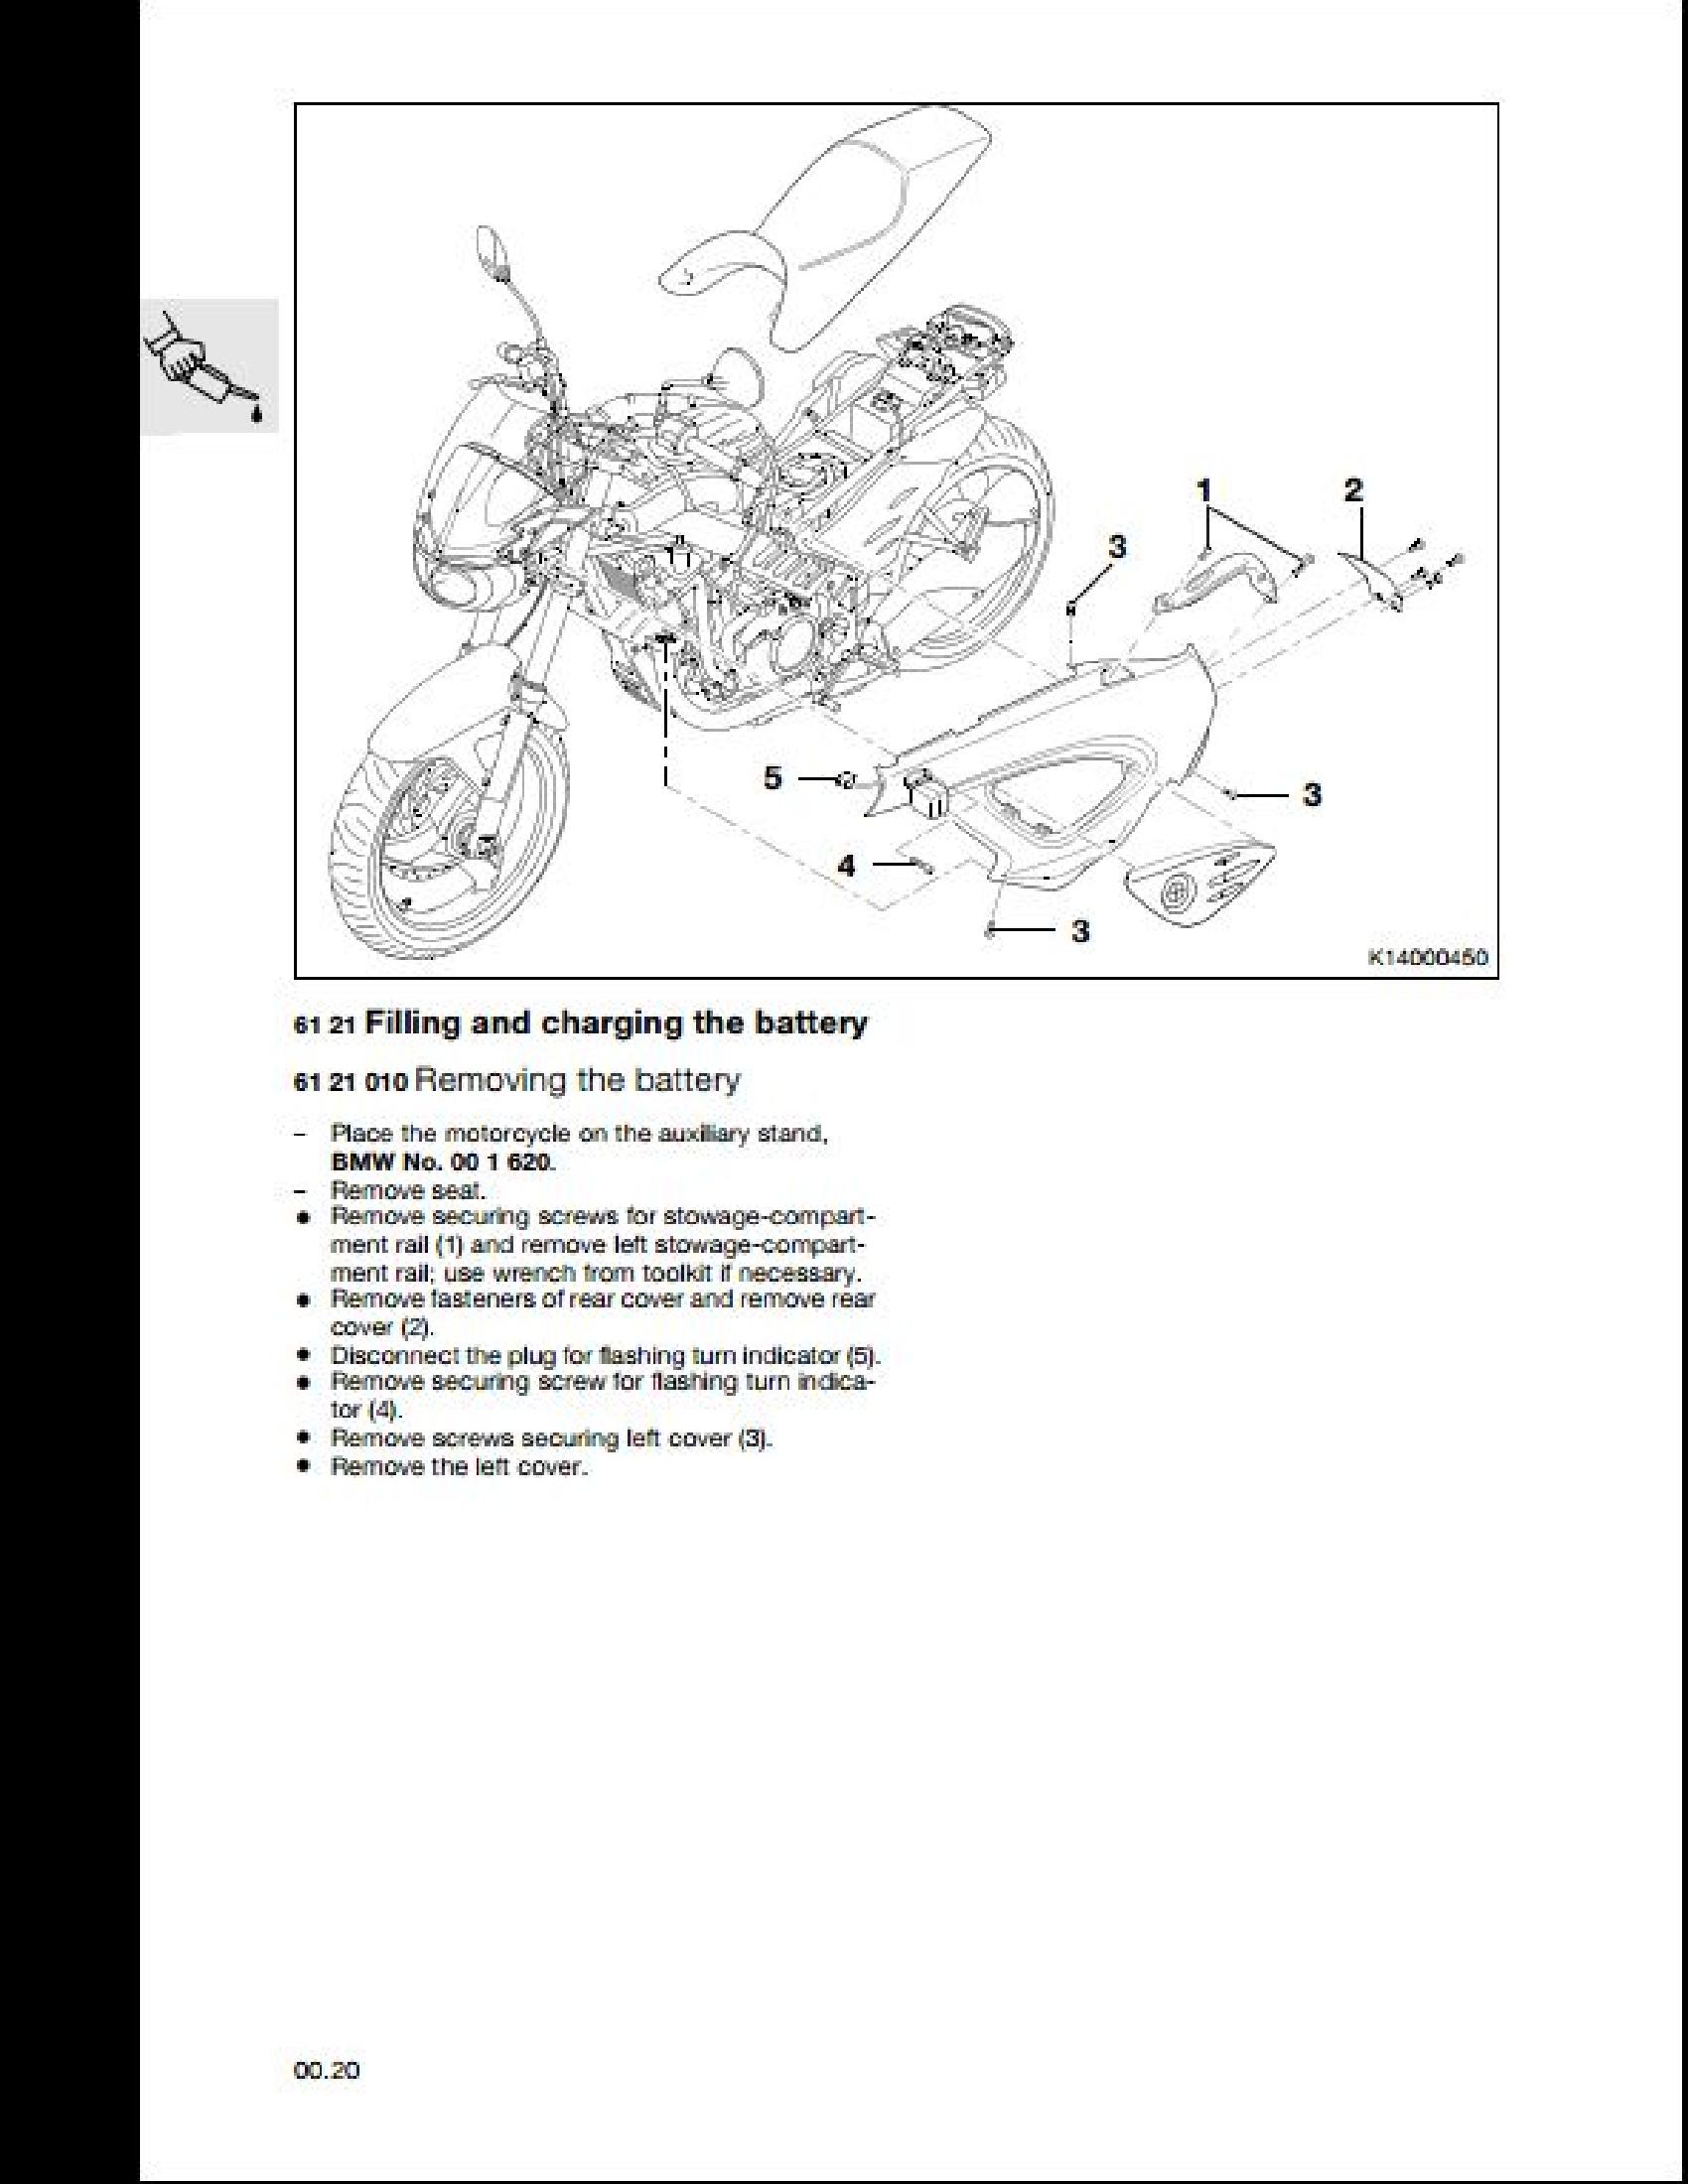 BMW F650CS Motorcycle manual